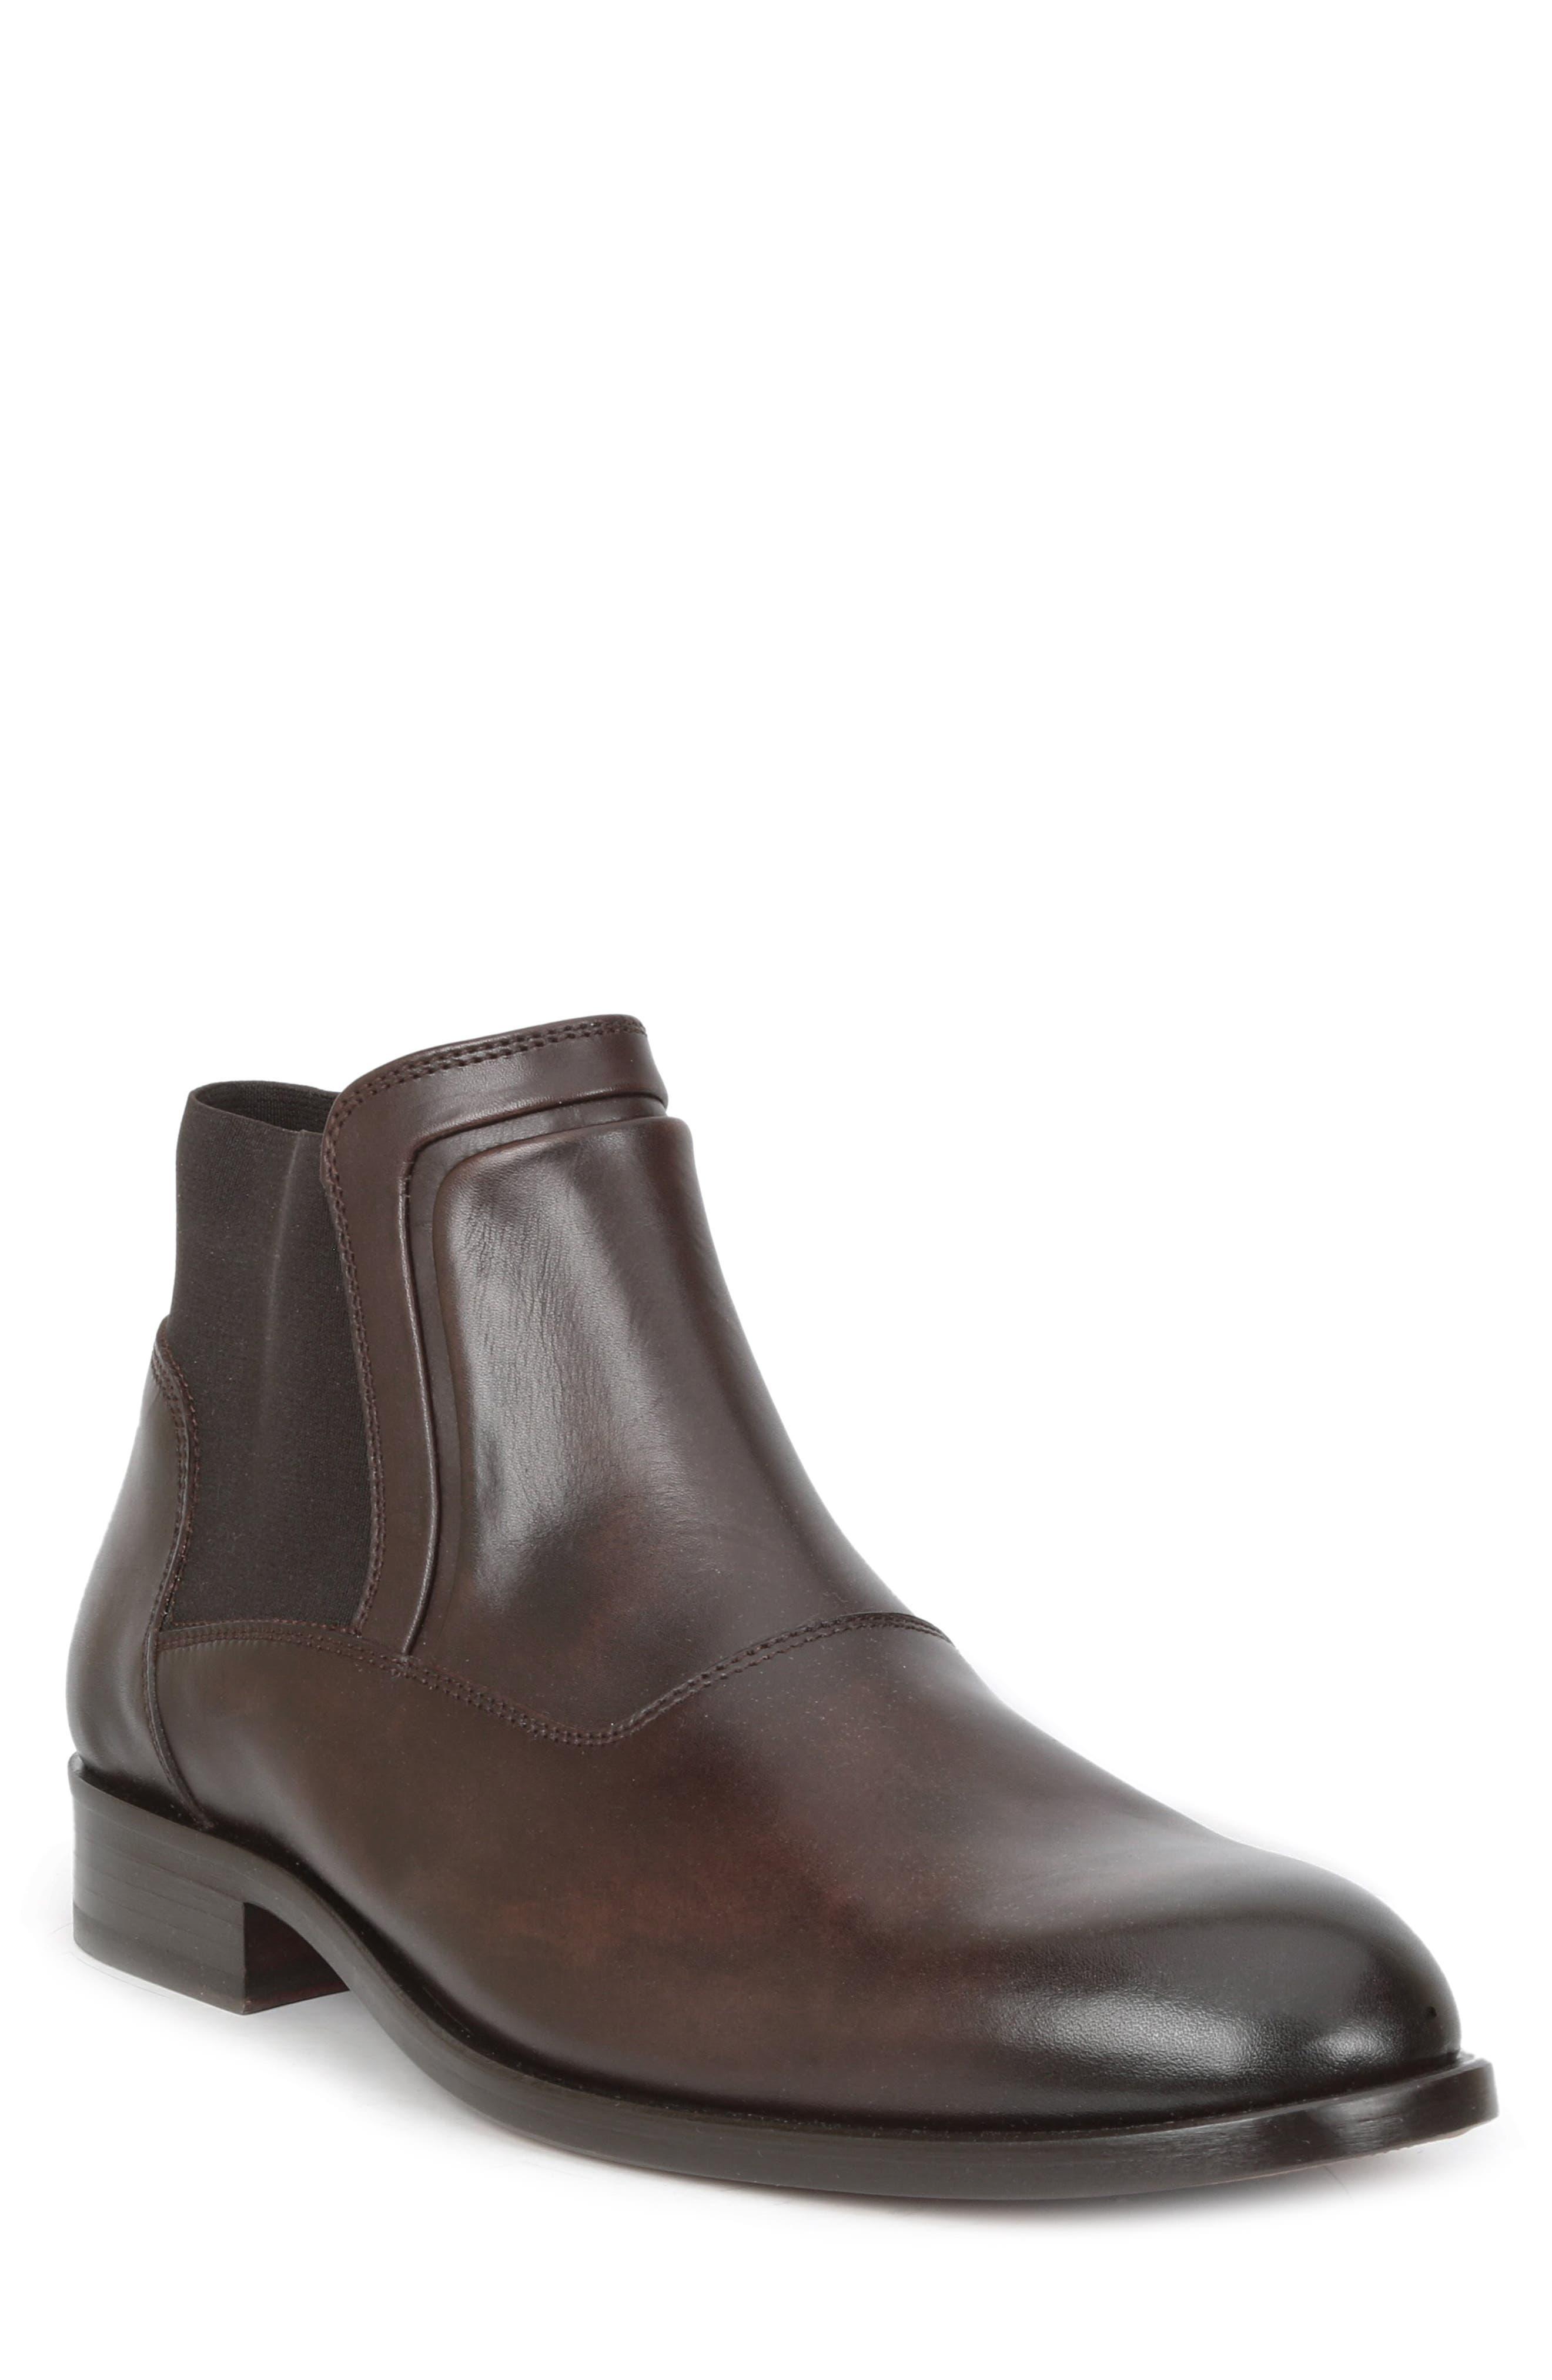 BRUNO MAGLI Sancho Dress Chelsea Boots in Dark Brown